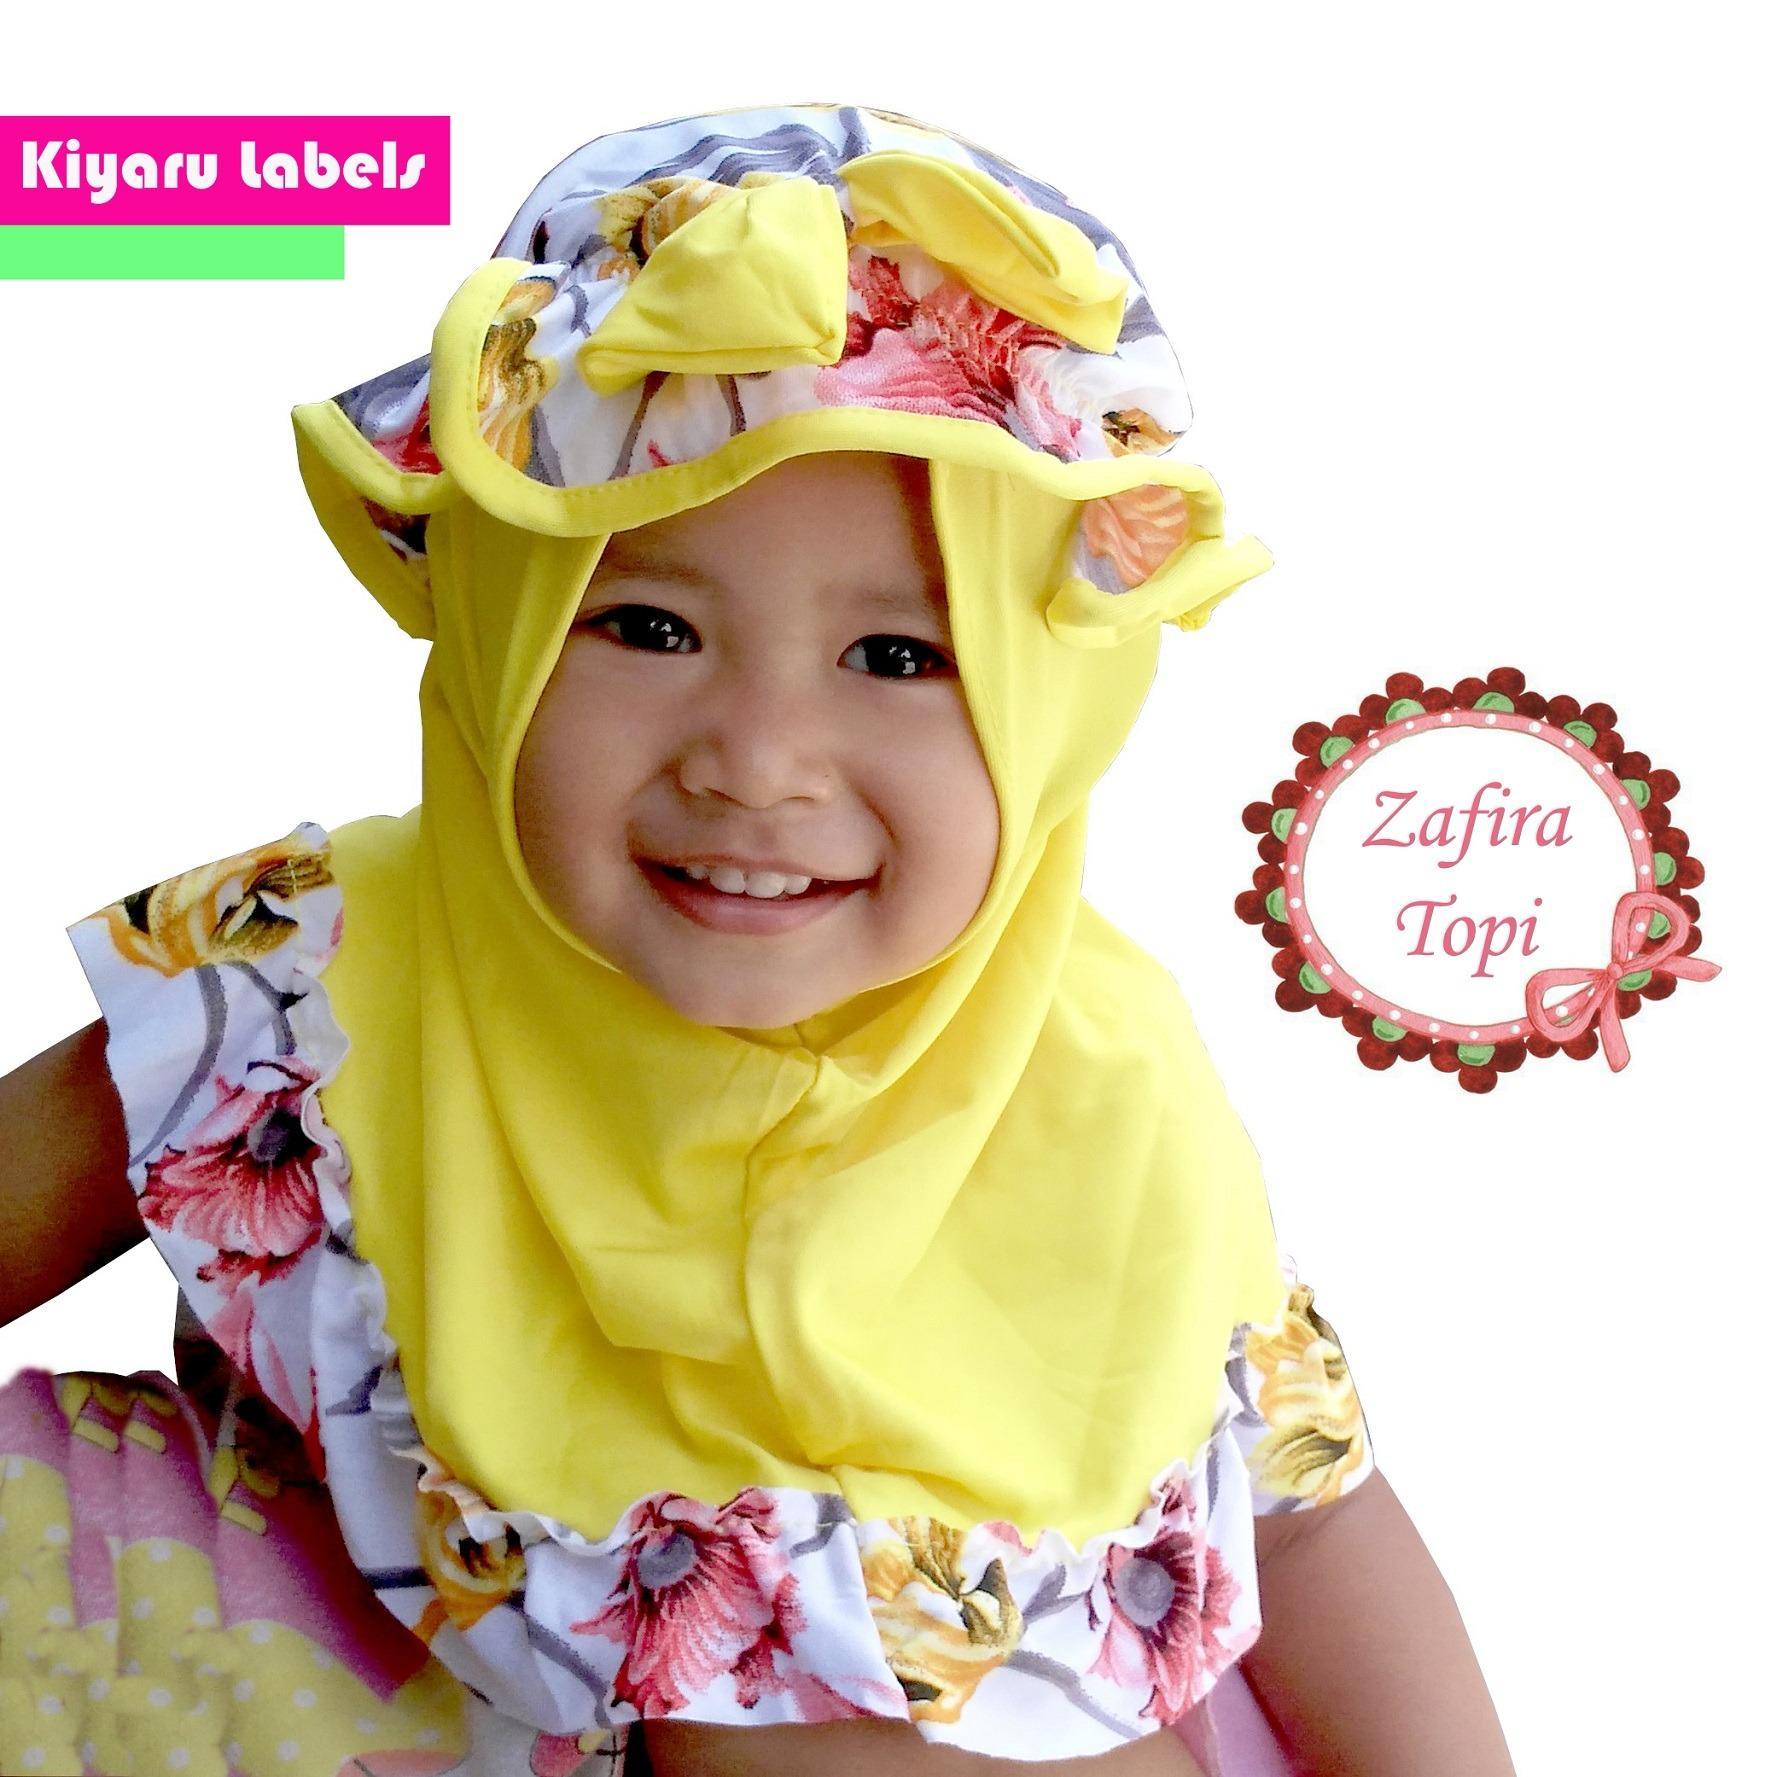 HQo Kerudung Anak Bayi Topi / Jilbab Anak Bayi / Hijab anak Bayi / Hijab Pashmina Instan / Kerudung Anak Zahra Topi (PROMO)